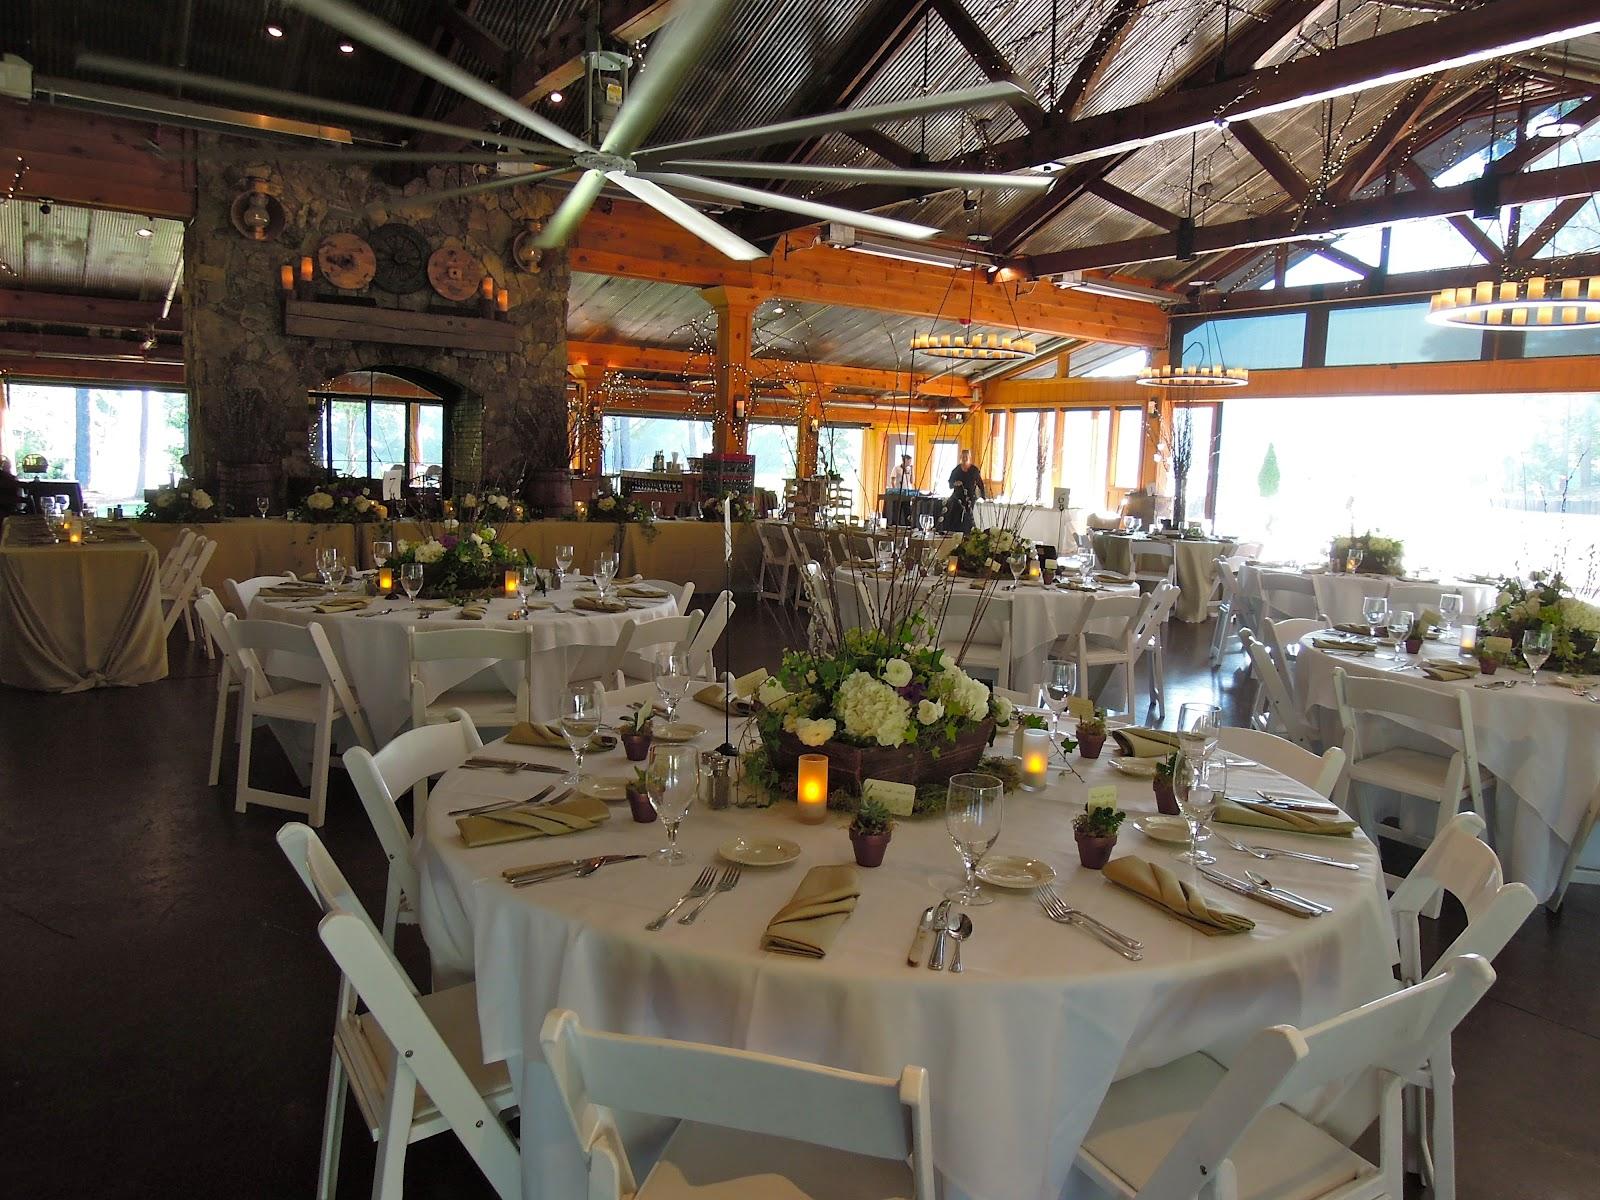 Raleigh Wedding Blog: Anna and Scott's Fabulous Wedding at ...